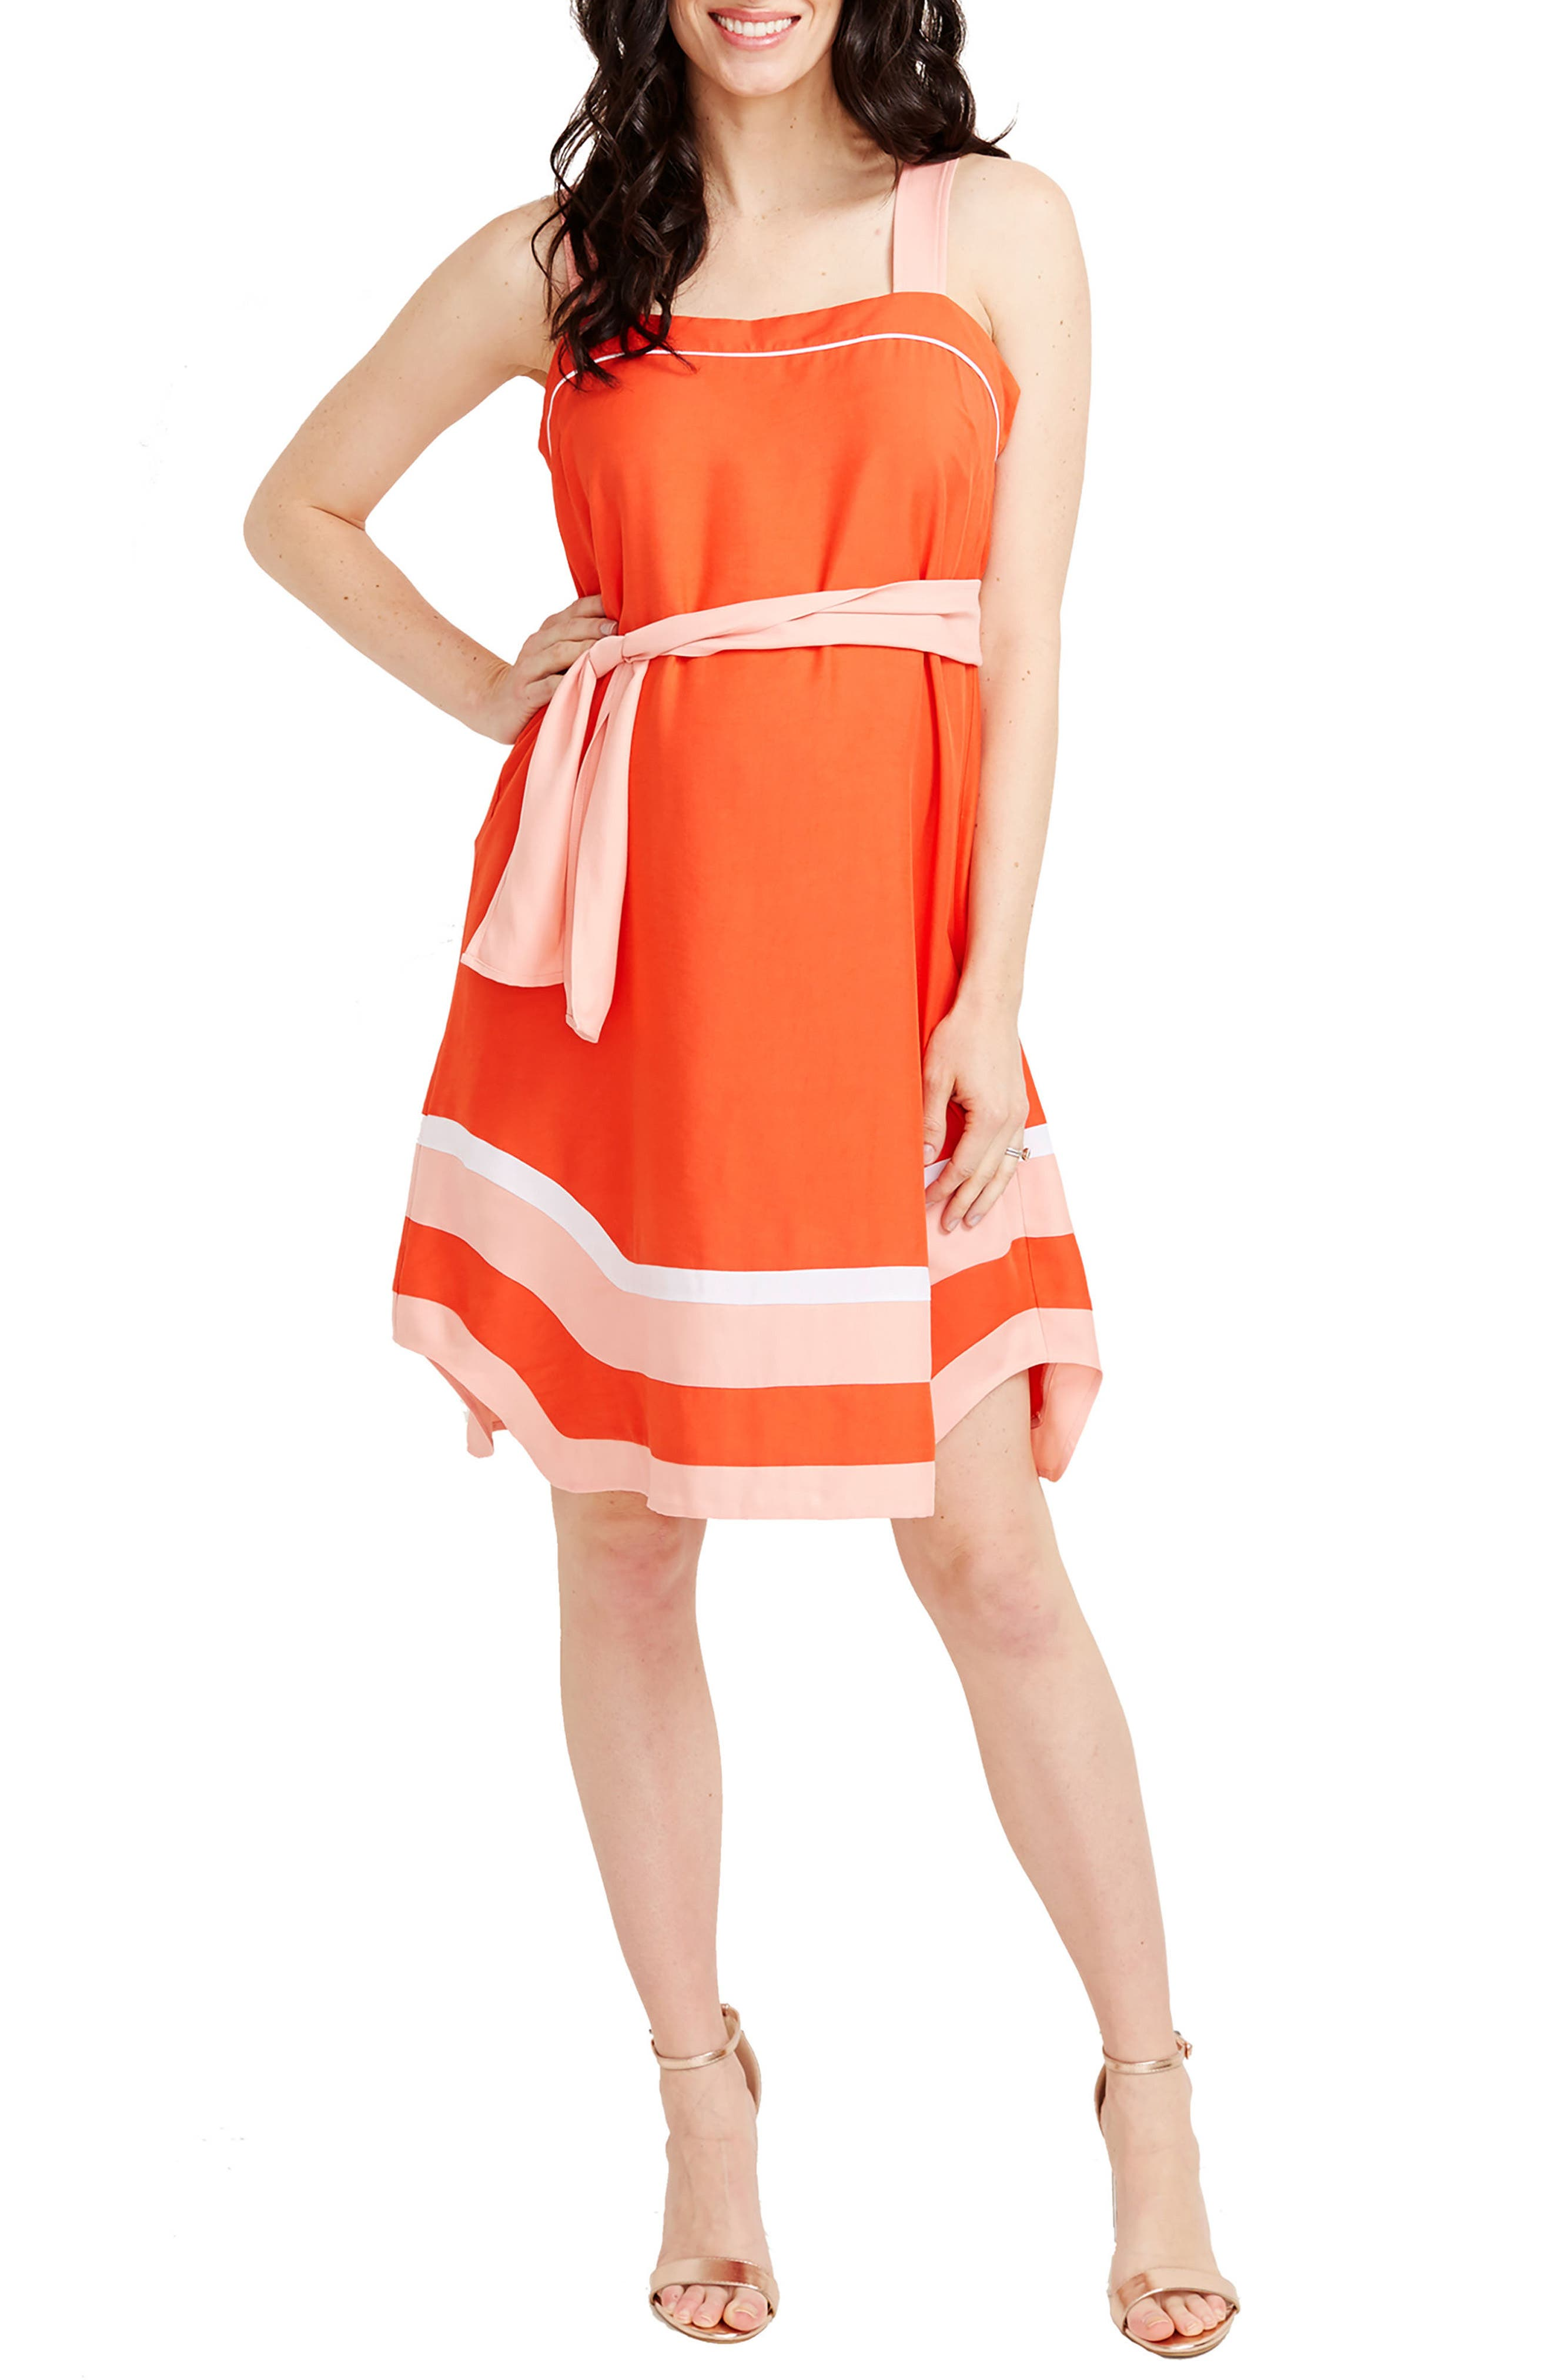 DELFINA MATERNITY DRESS